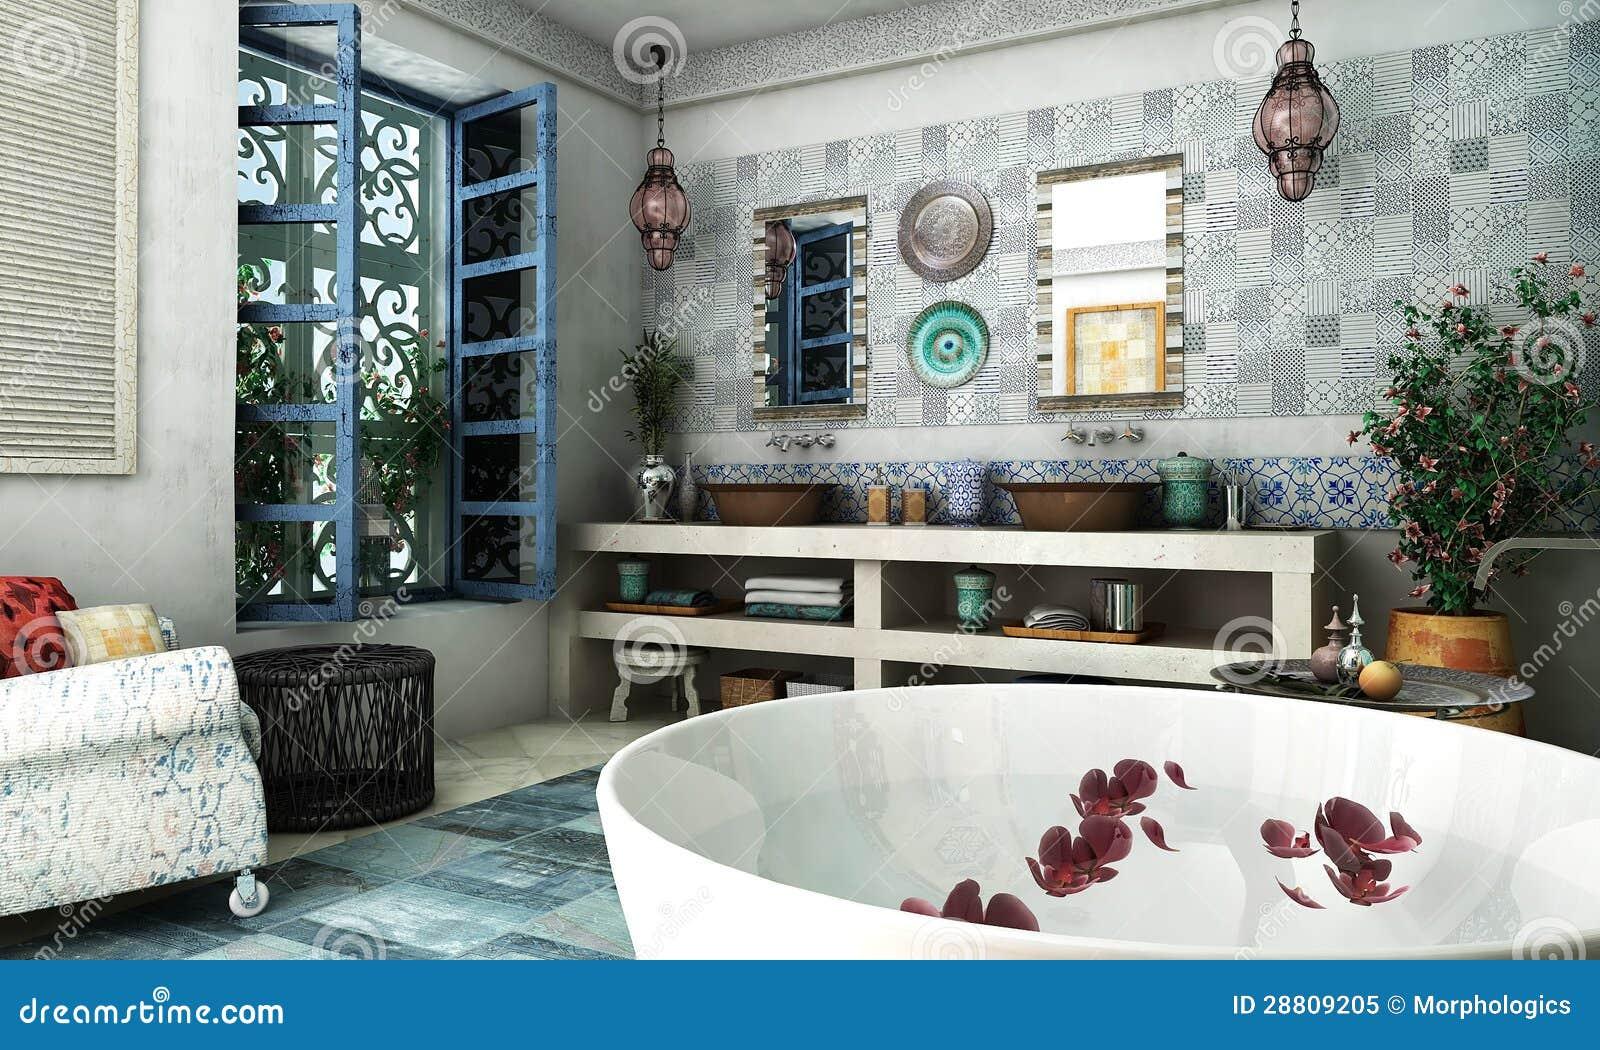 Marokkaanse badkamers stock afbeelding. Afbeelding bestaande uit ...